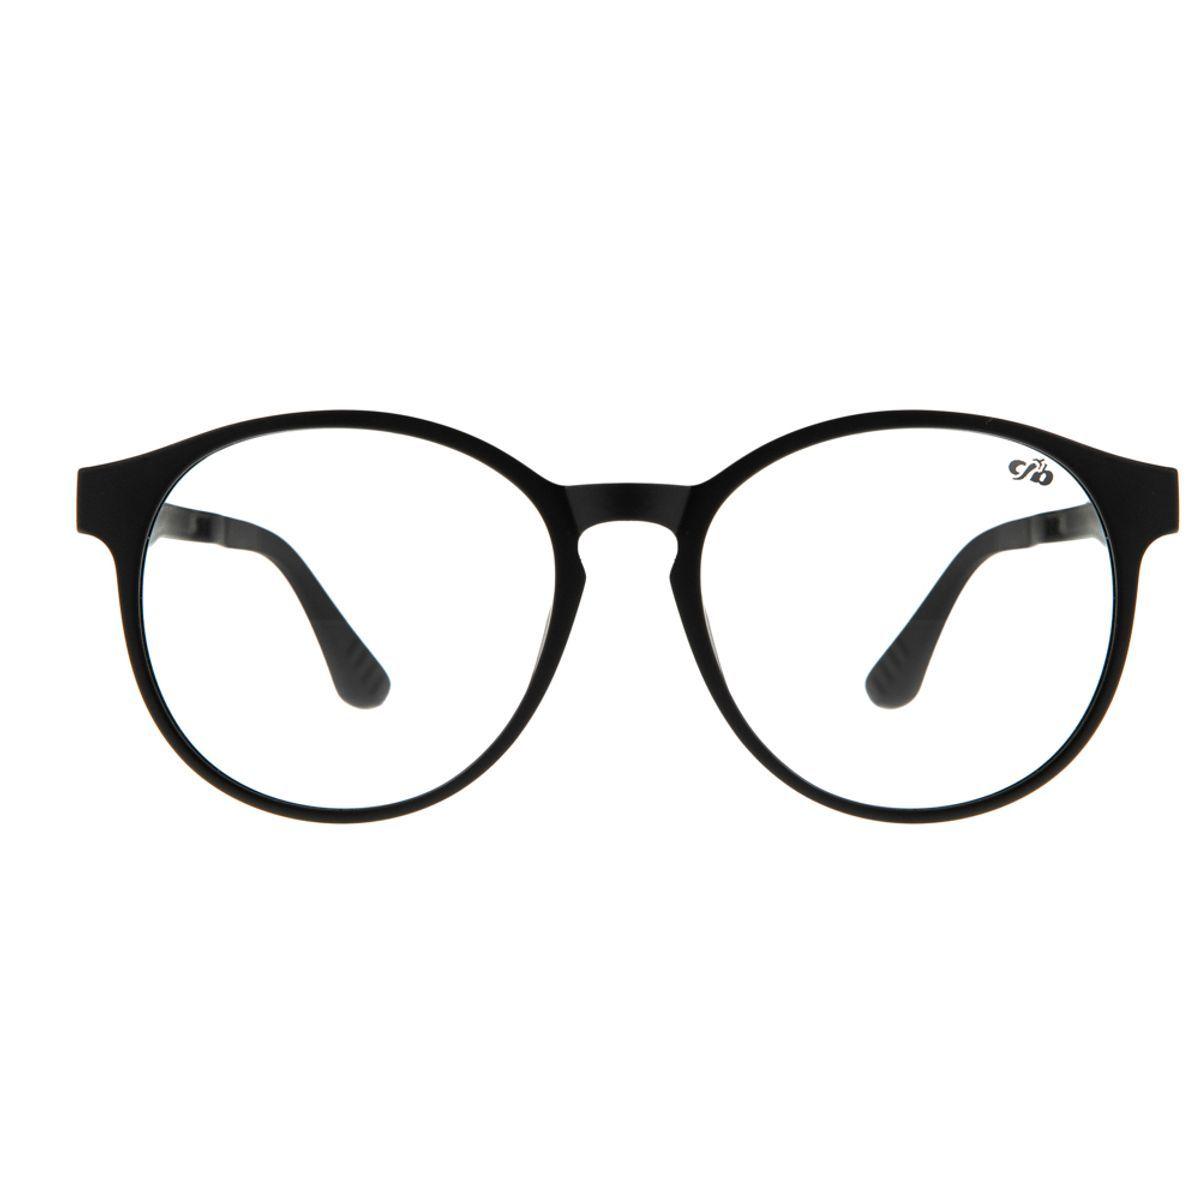 Lv Mu 0139 1501 Chilli Beans Armacoes De Oculos Modelos De